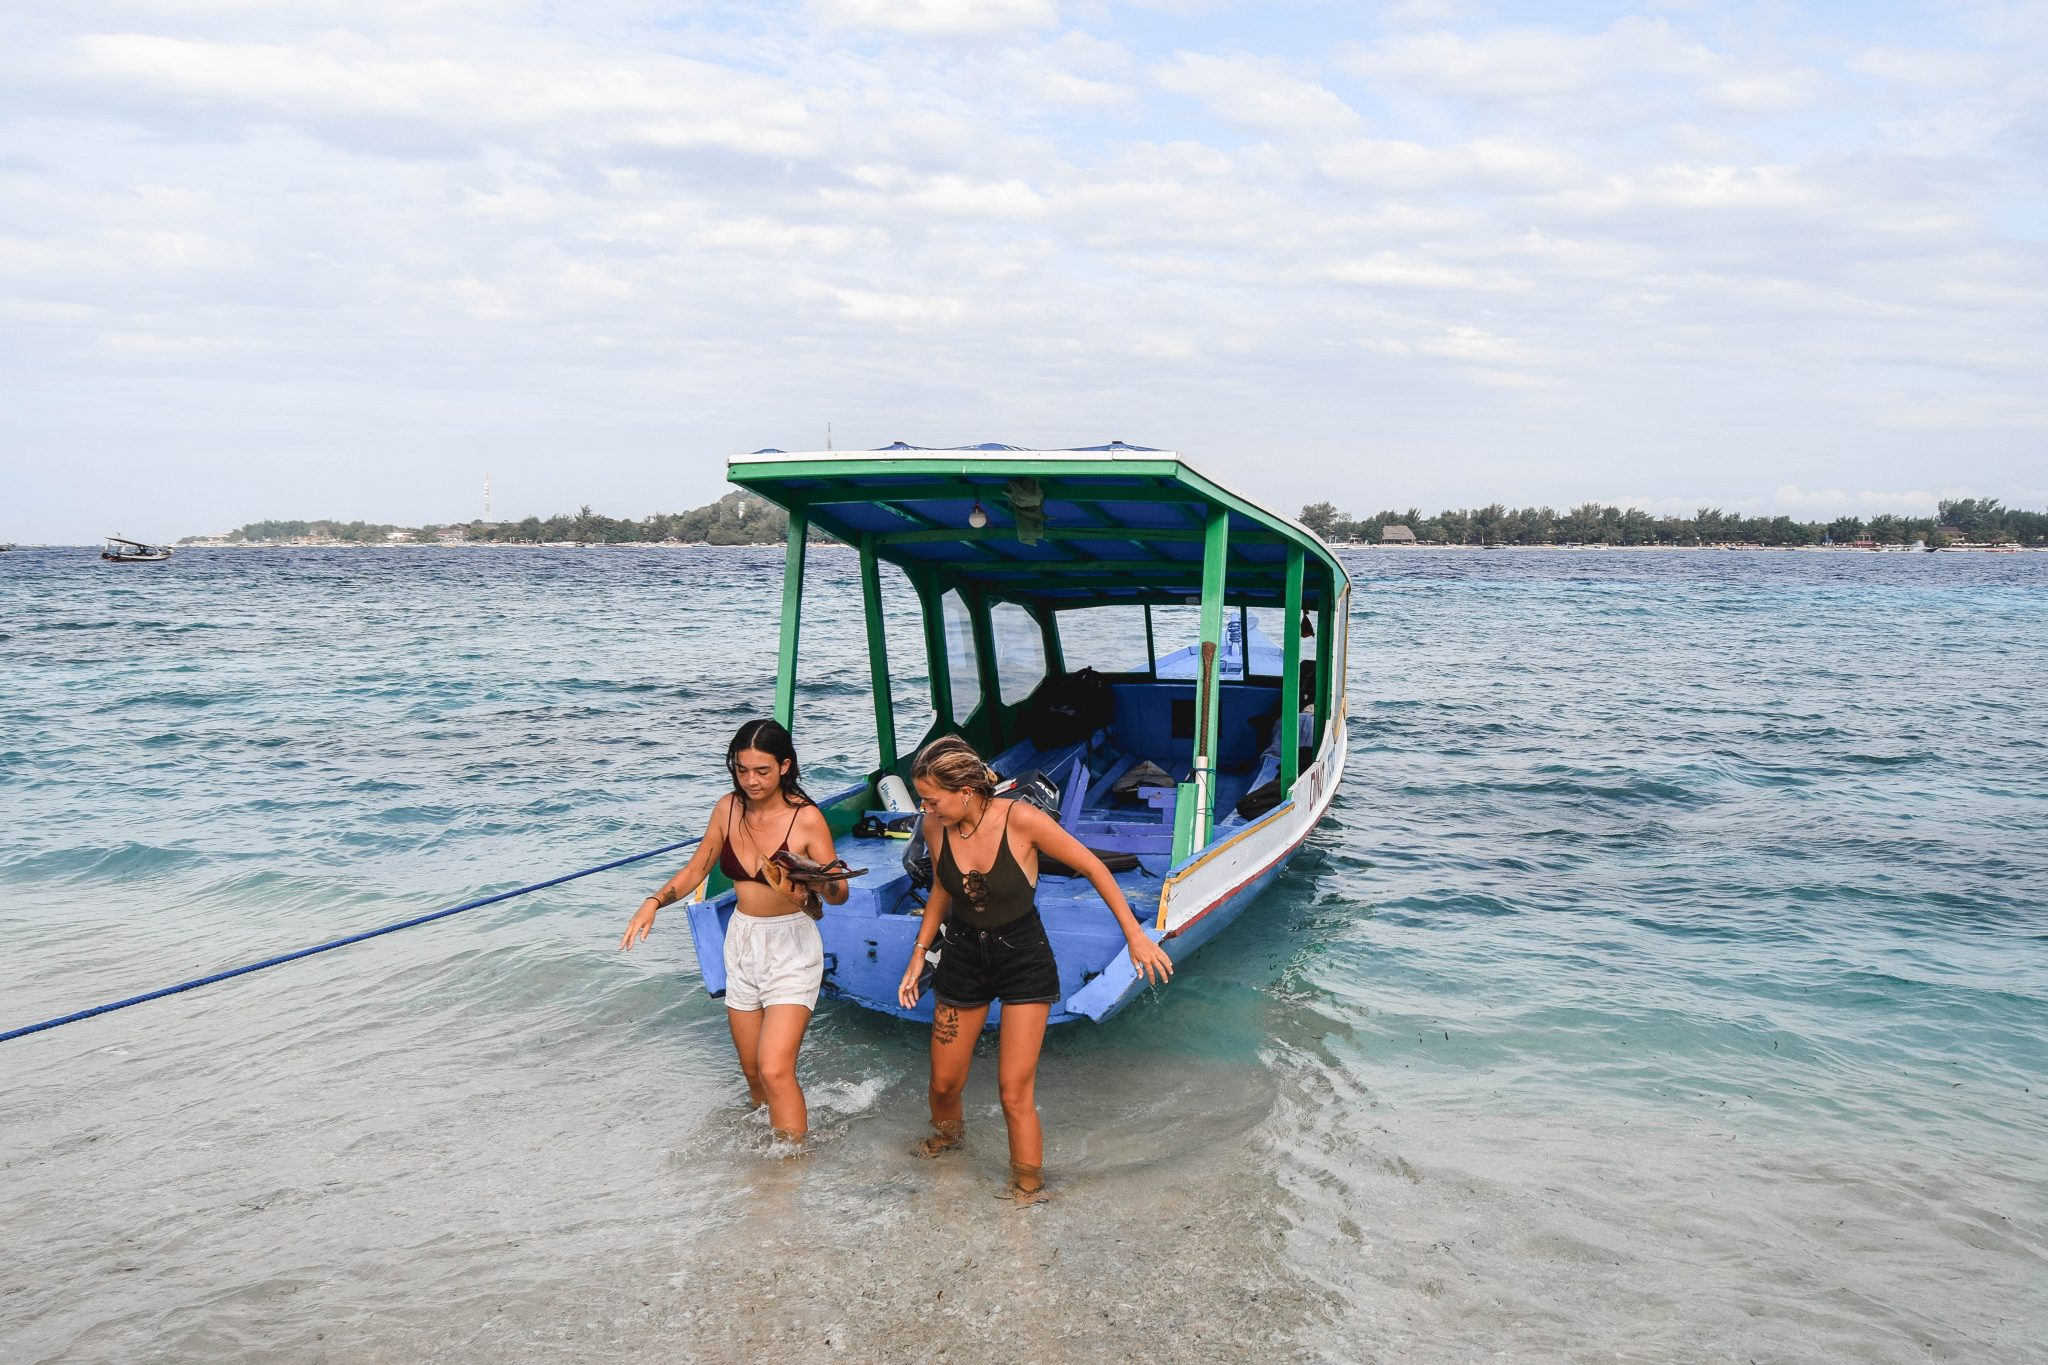 Wanderers & Warriors - Charlie & Lauren UK Travel Couple - Gili Trawangan Snorkeling Tour - Snorkeling Gili Trawangan